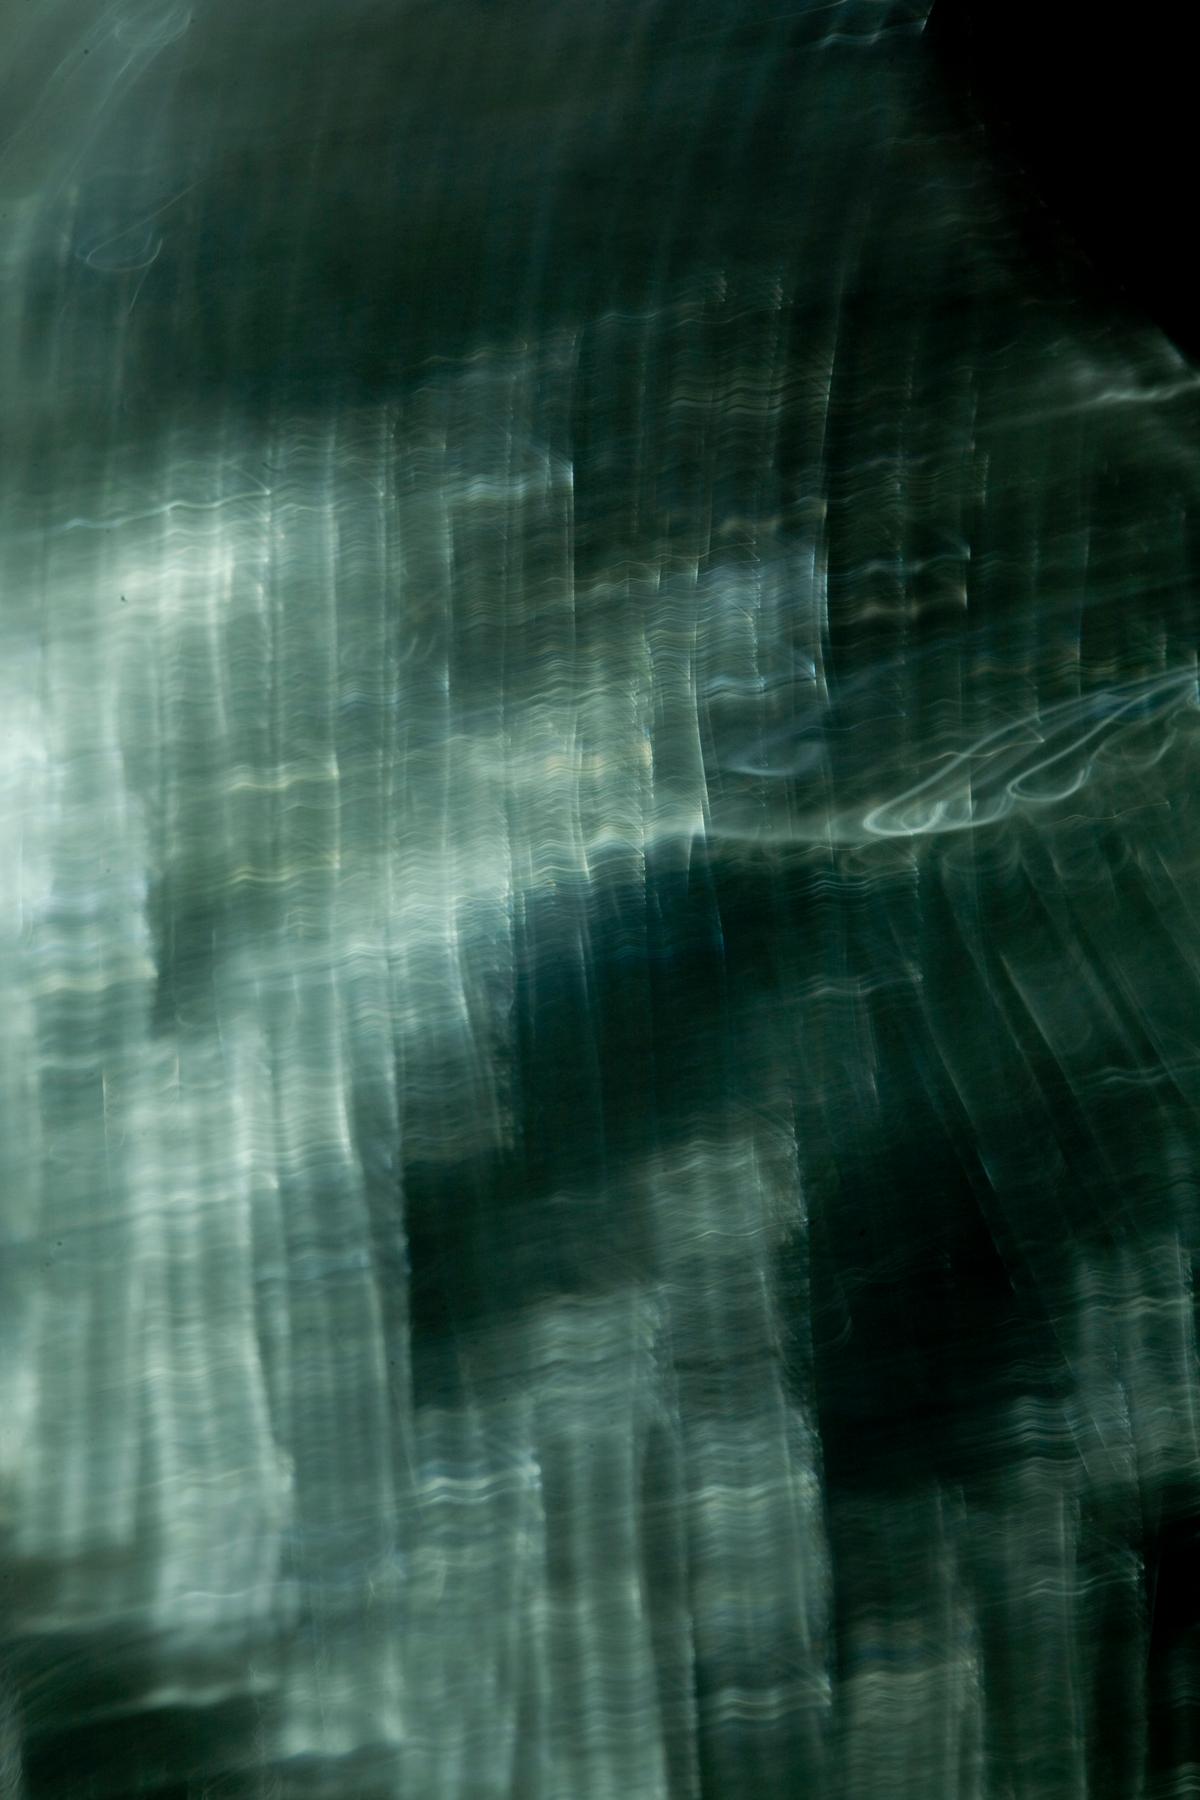 Suite Aquatico, 2009, Abstract Color Photography, Shirine Gill